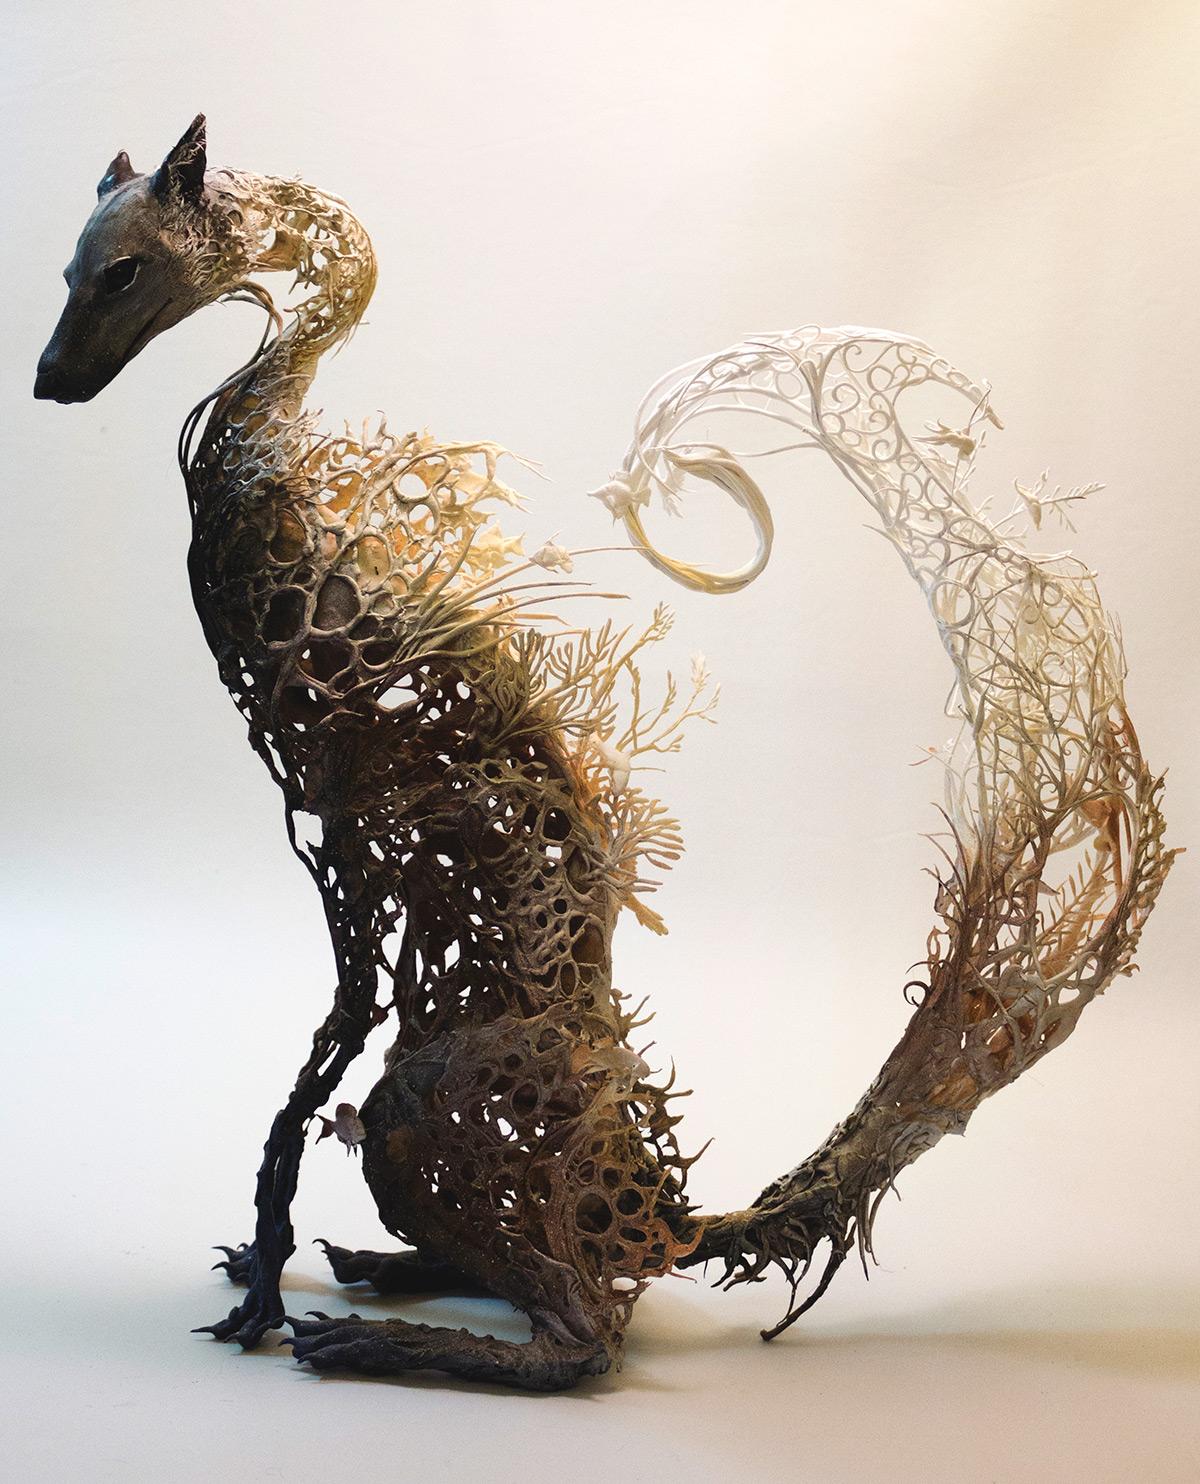 volpe-sculture-surrealiste-ellen-jewett